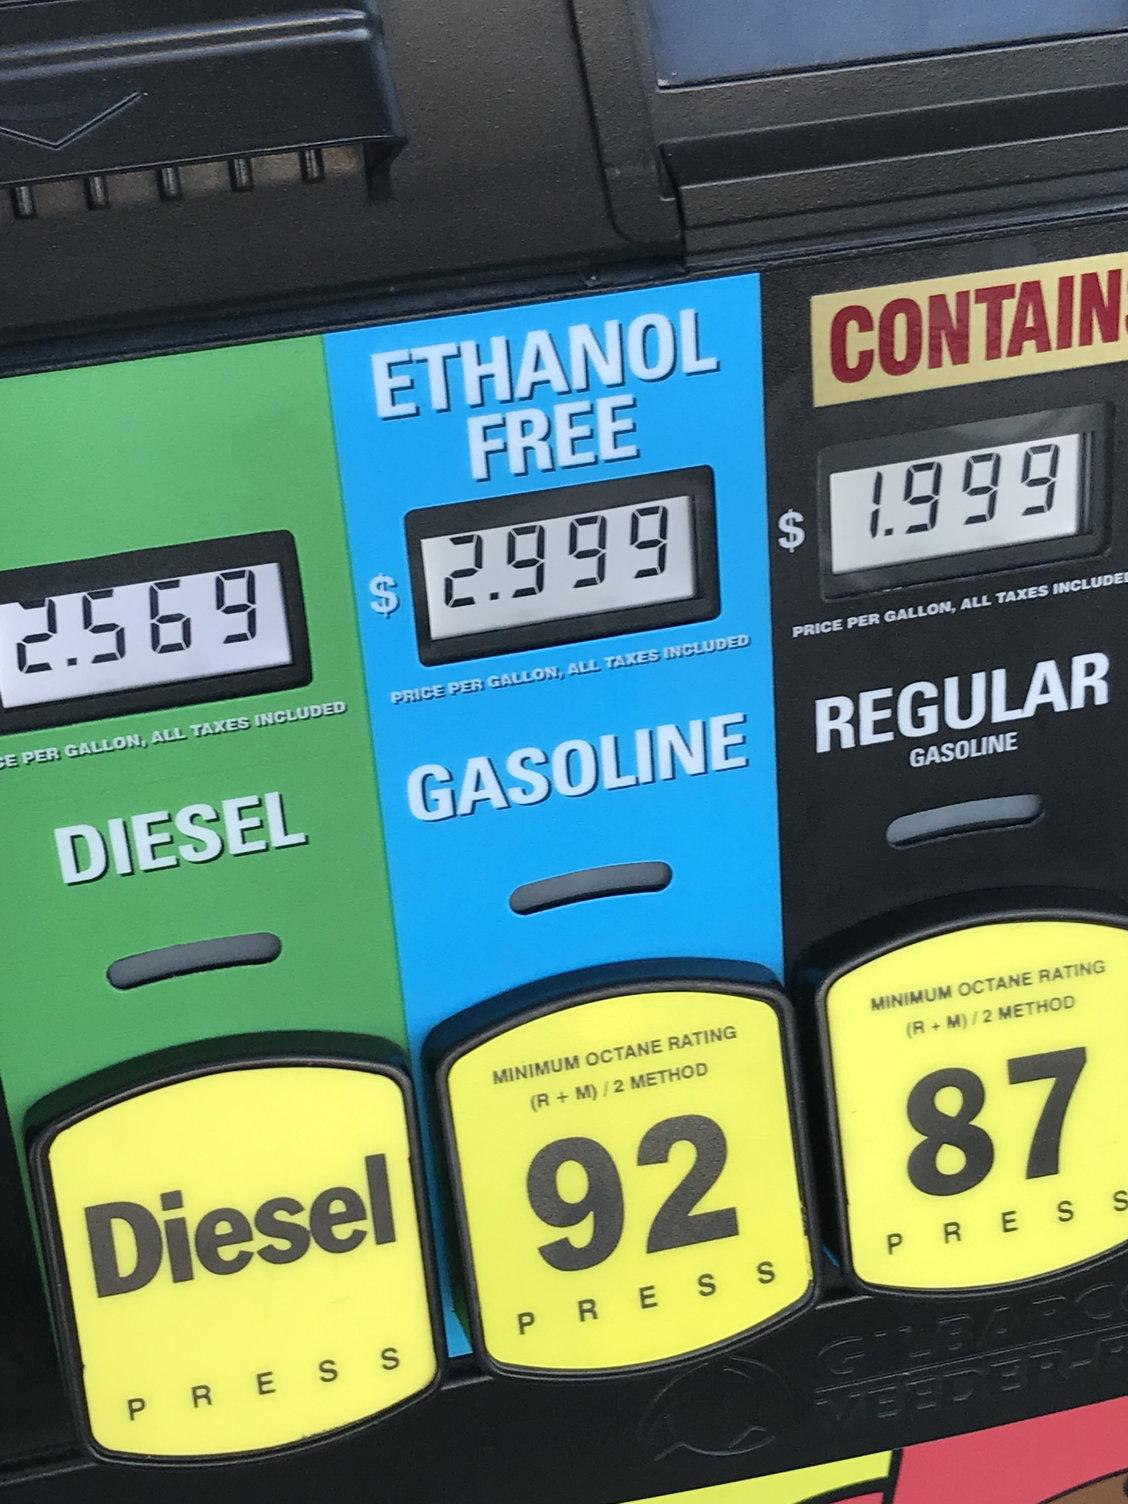 93 octane ethanol free gas near me